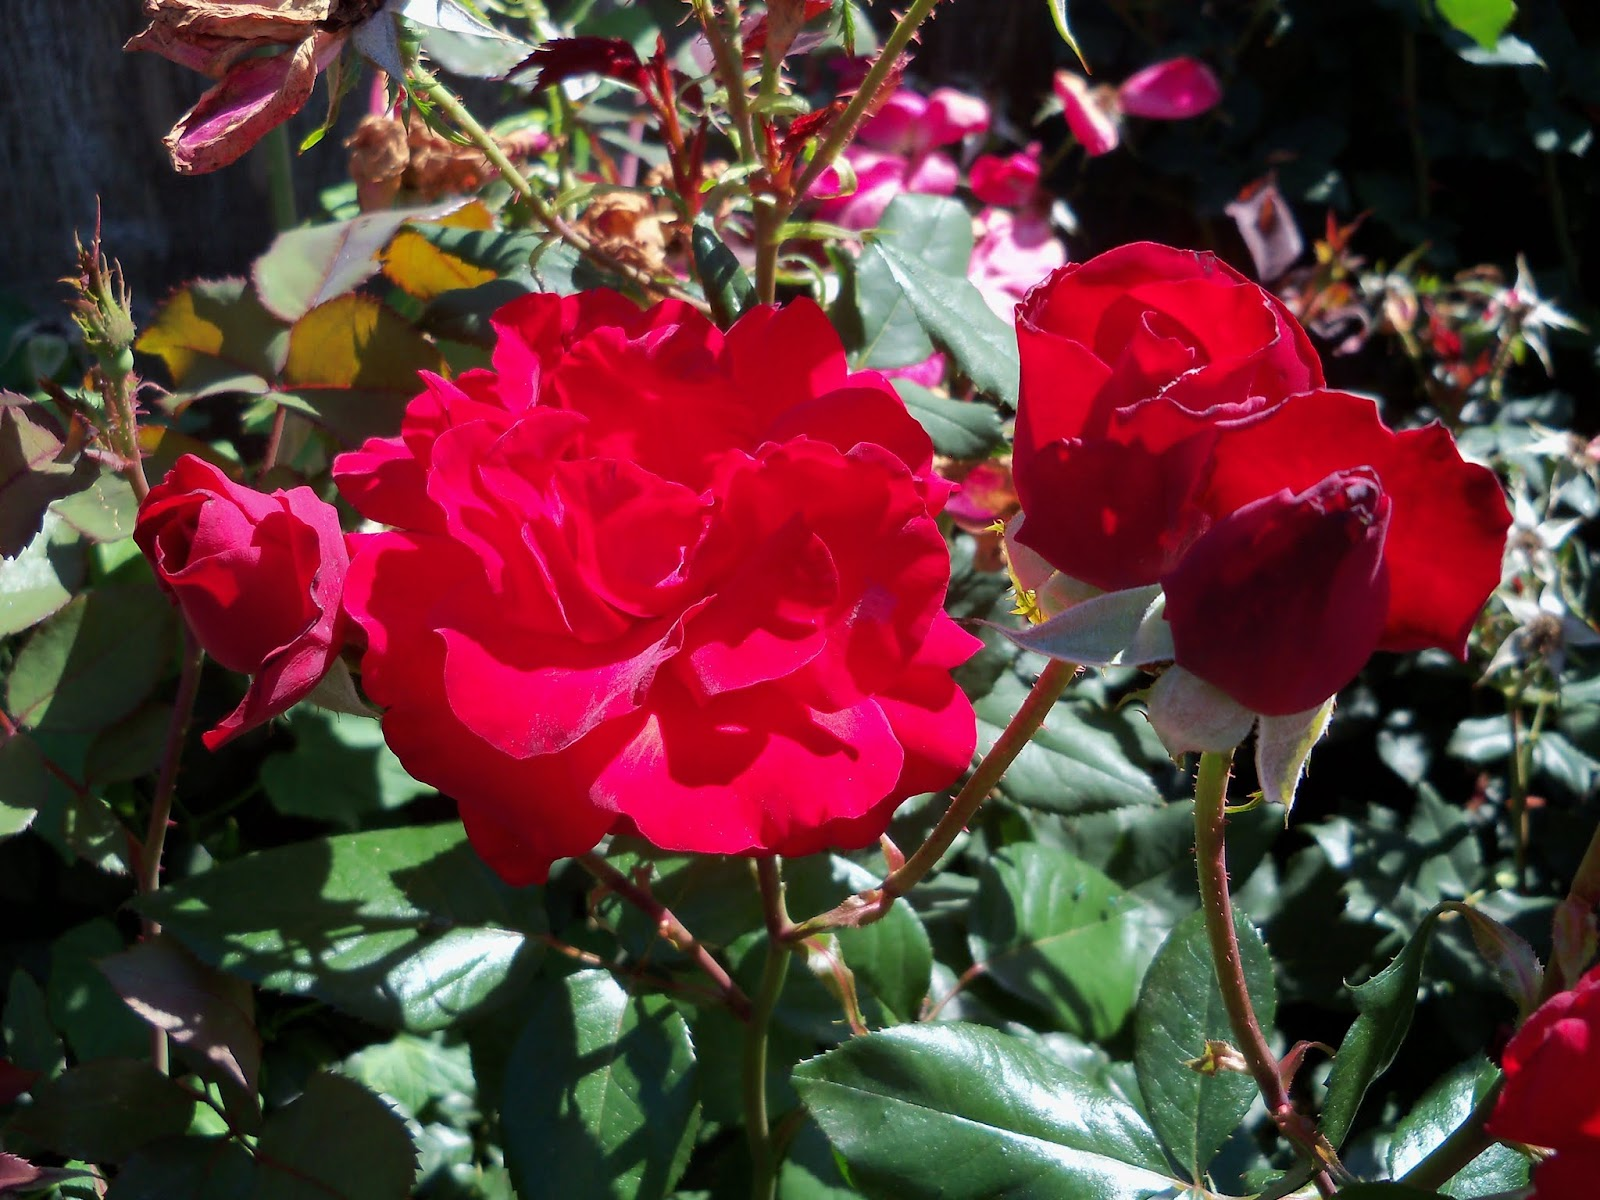 Gardening 2013 - 115_6205.JPG